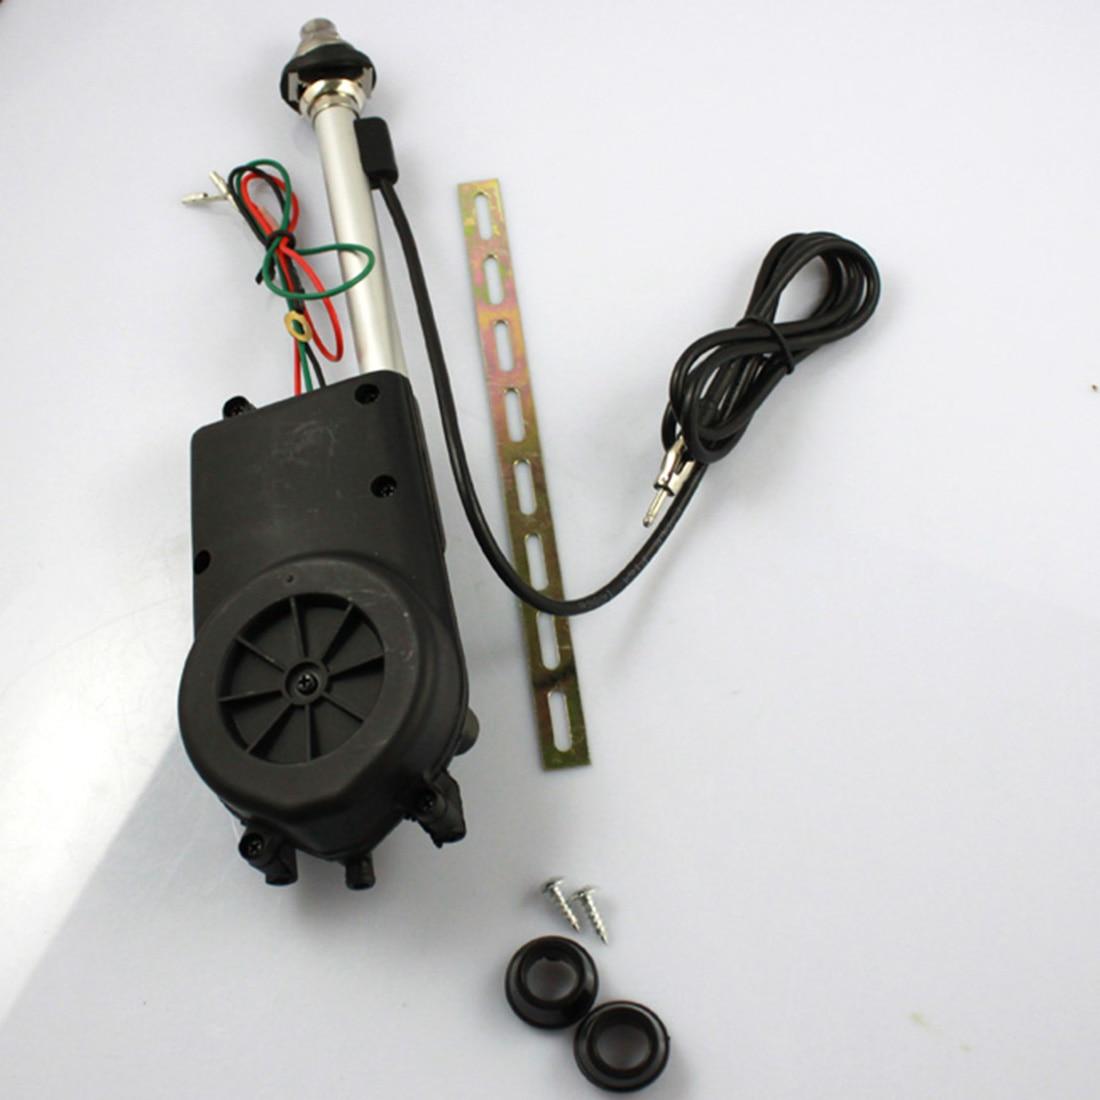 Marsnaska Universal font b Car b font Antenna Electric Power Antenna Replacement Kit Vehicle Am Fm